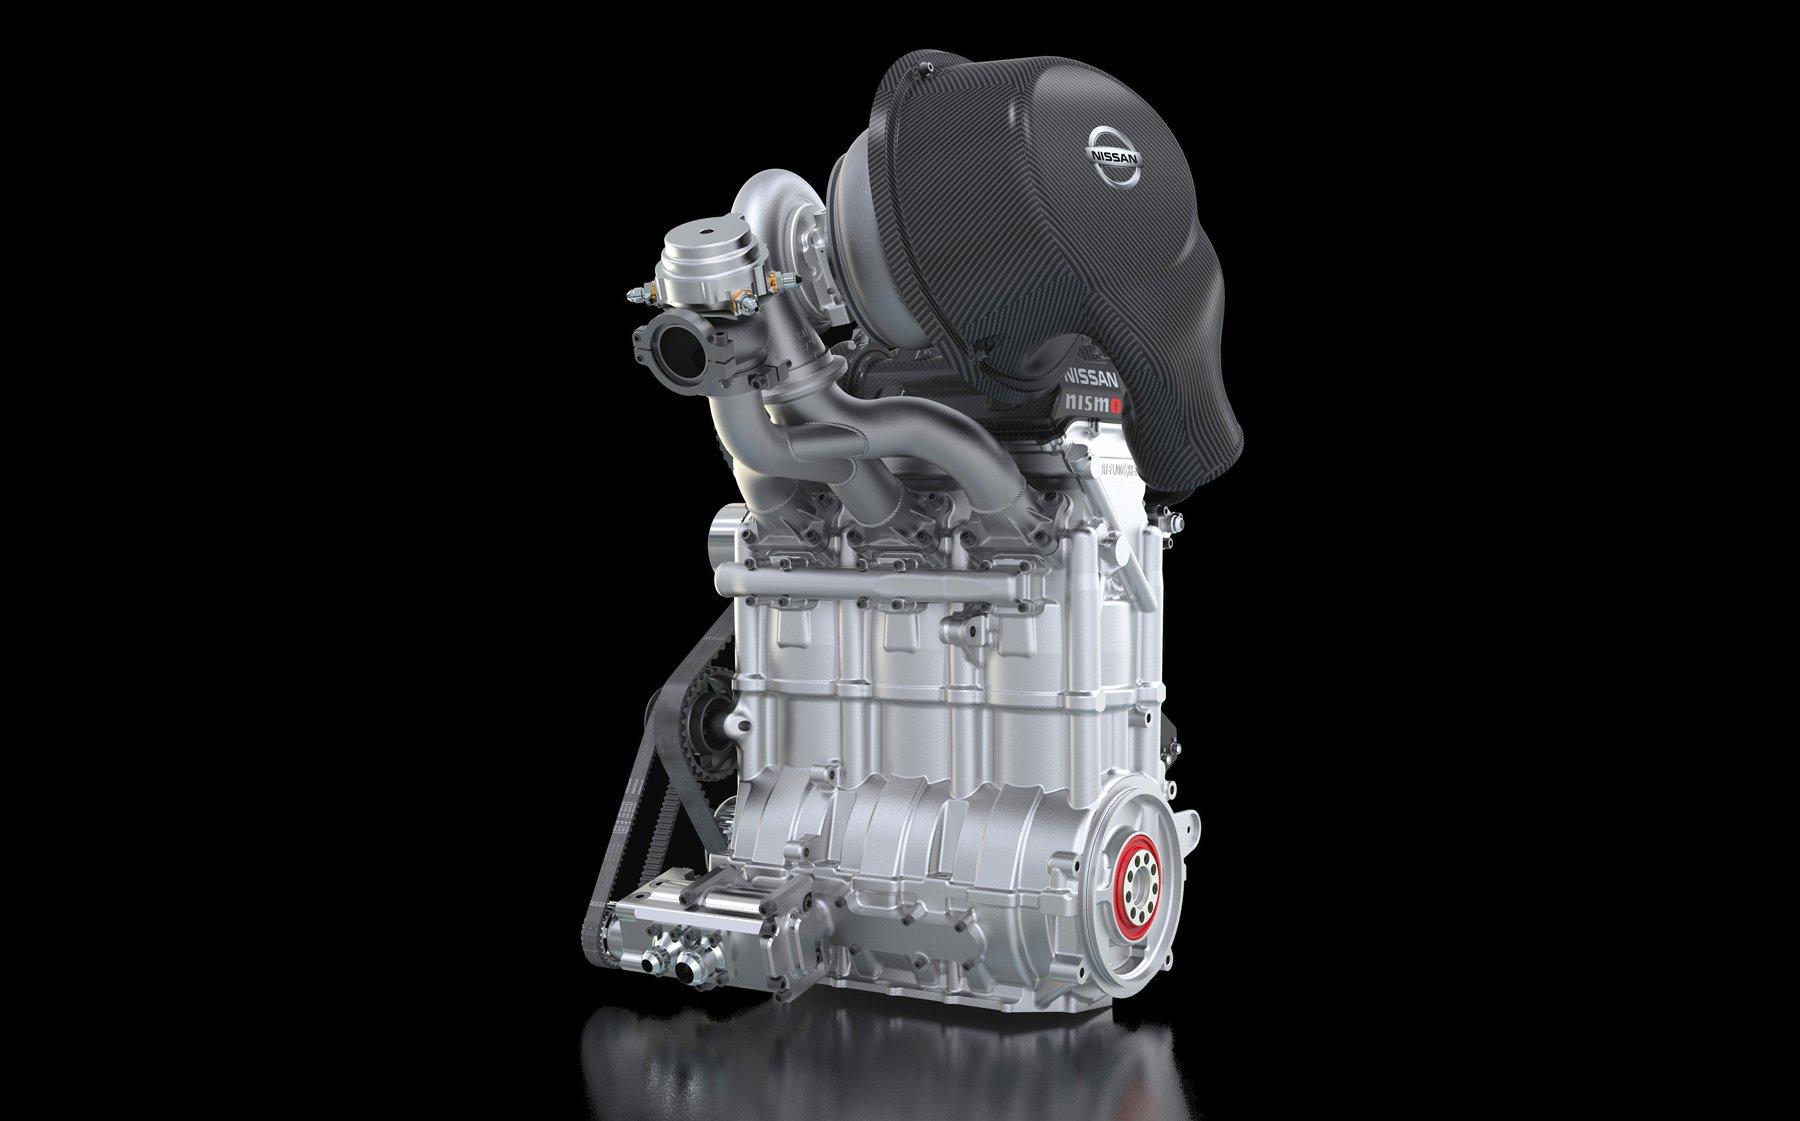 Nissan DIG-T R Motor